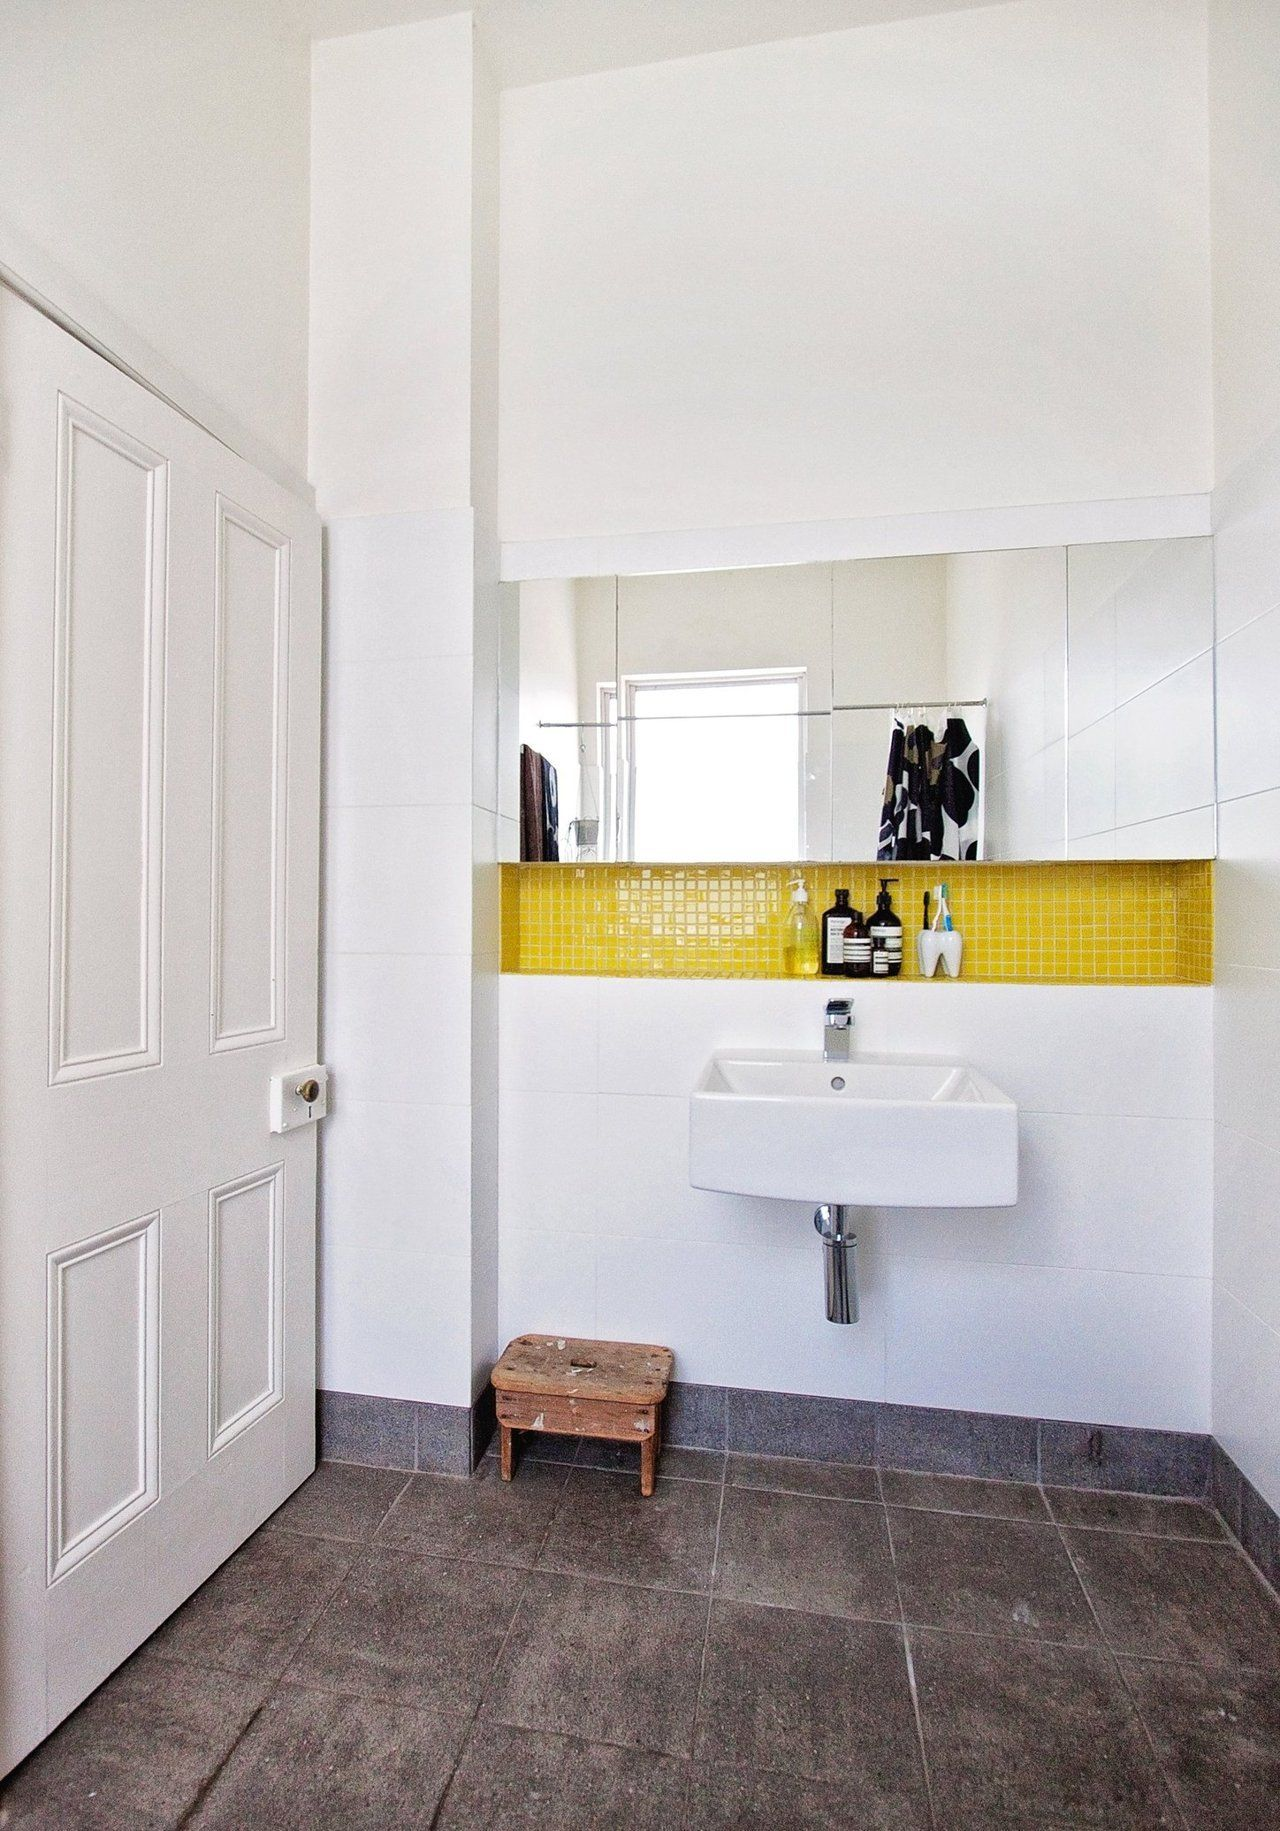 Beci Raph S Art Filled Home In Australia Yellow Bathrooms Trendy Bathroom Tiles Bathroom Inspiration